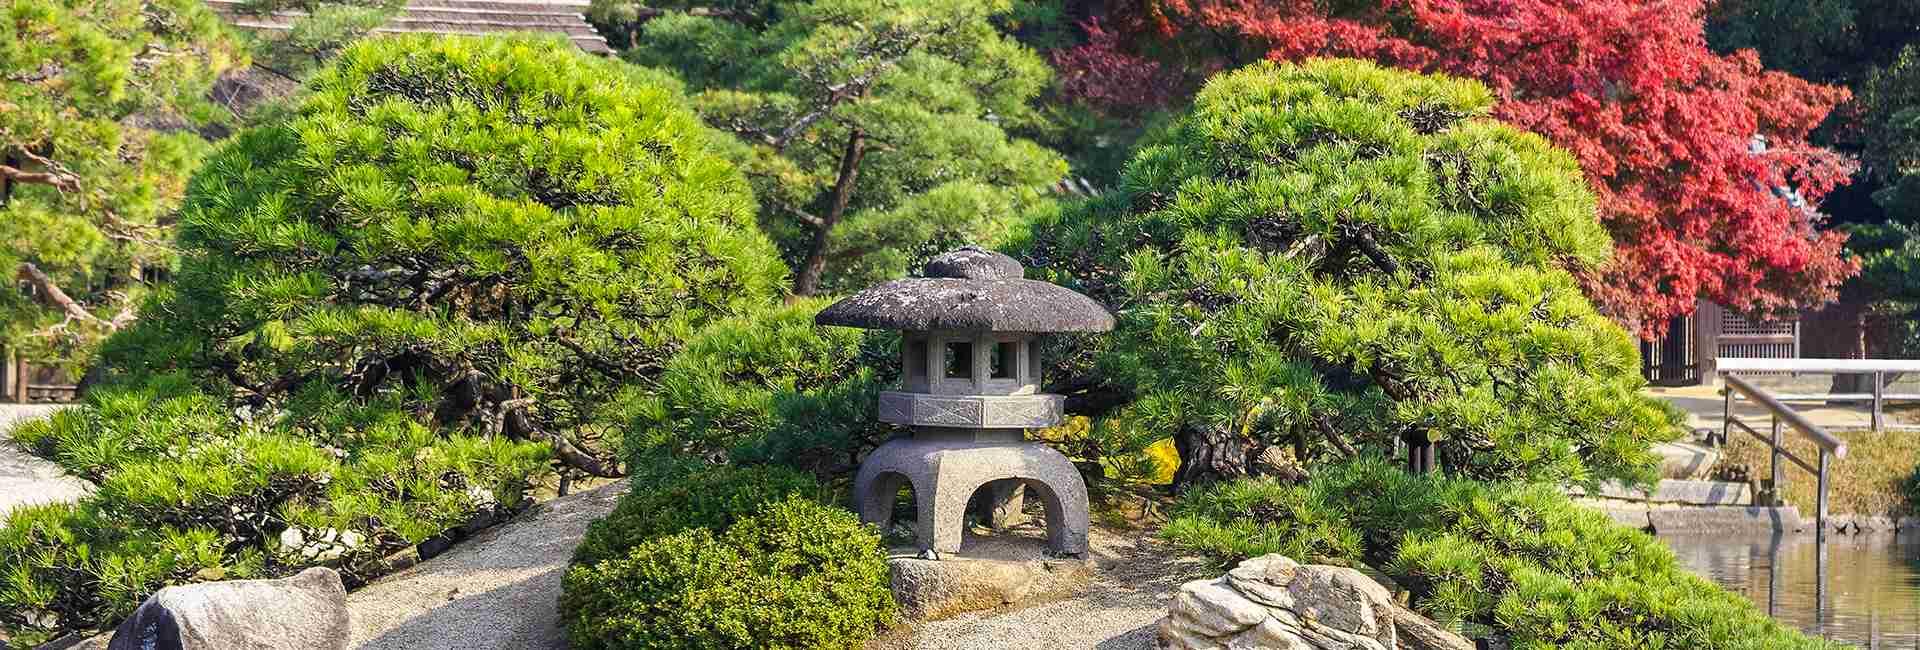 jardin kenrokuen à Okayama au Japon